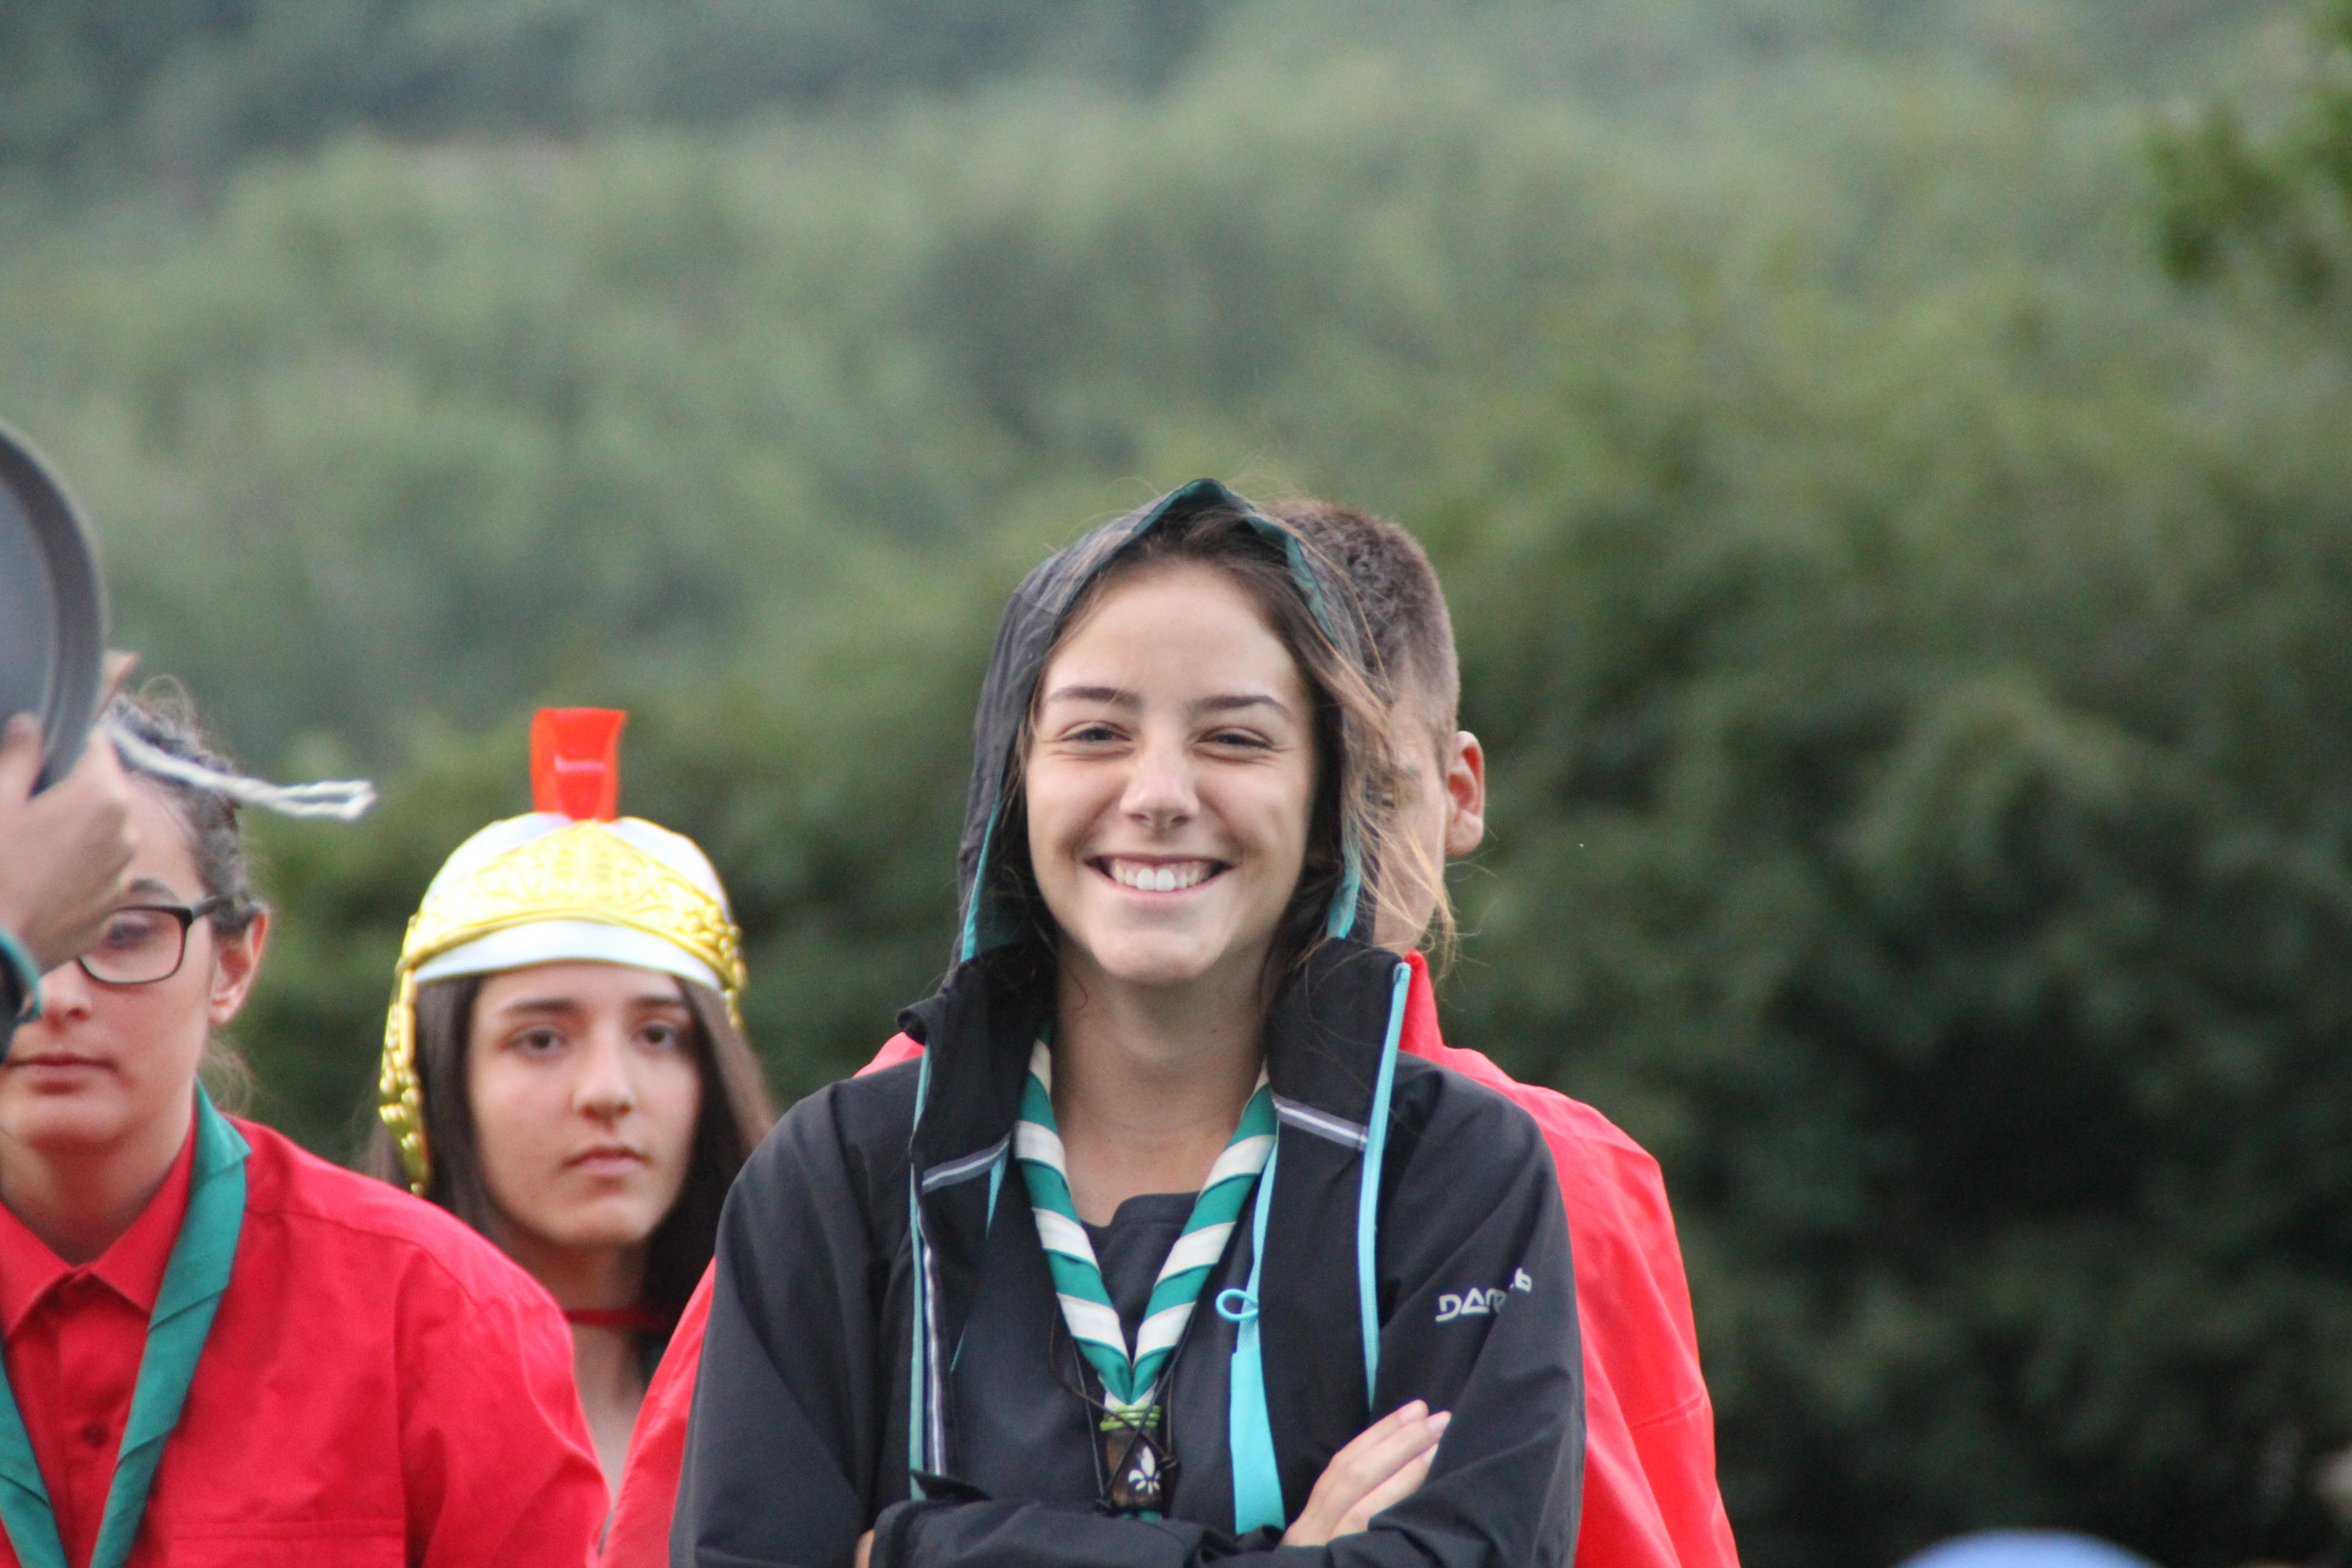 15-16 - Grupo - Campamento de verano - P280